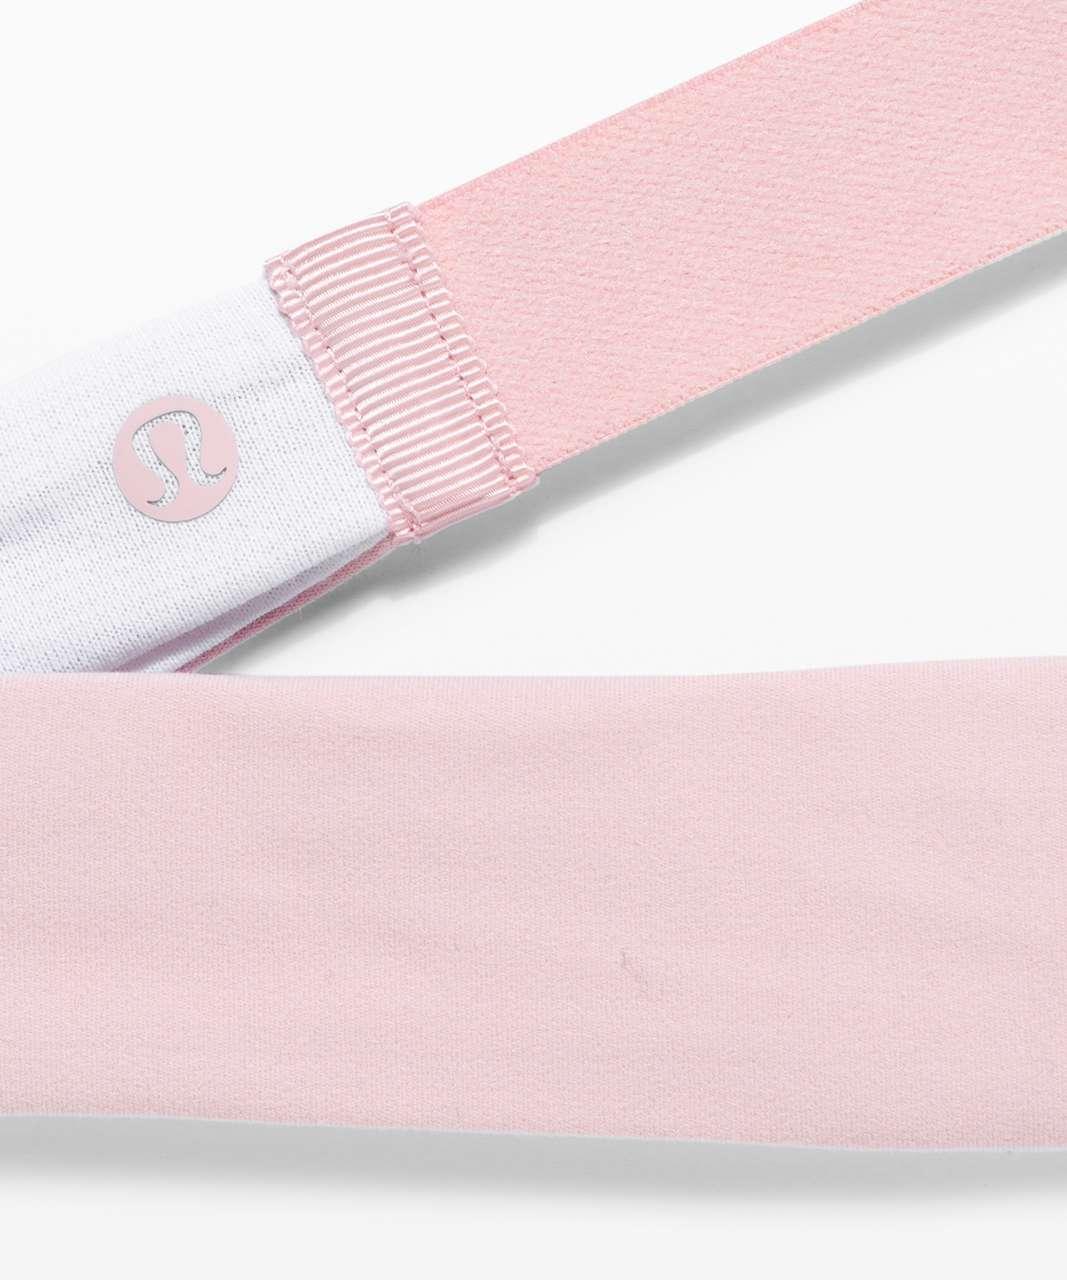 Lululemon Fringe Fighter Headband - White / Misty Pink